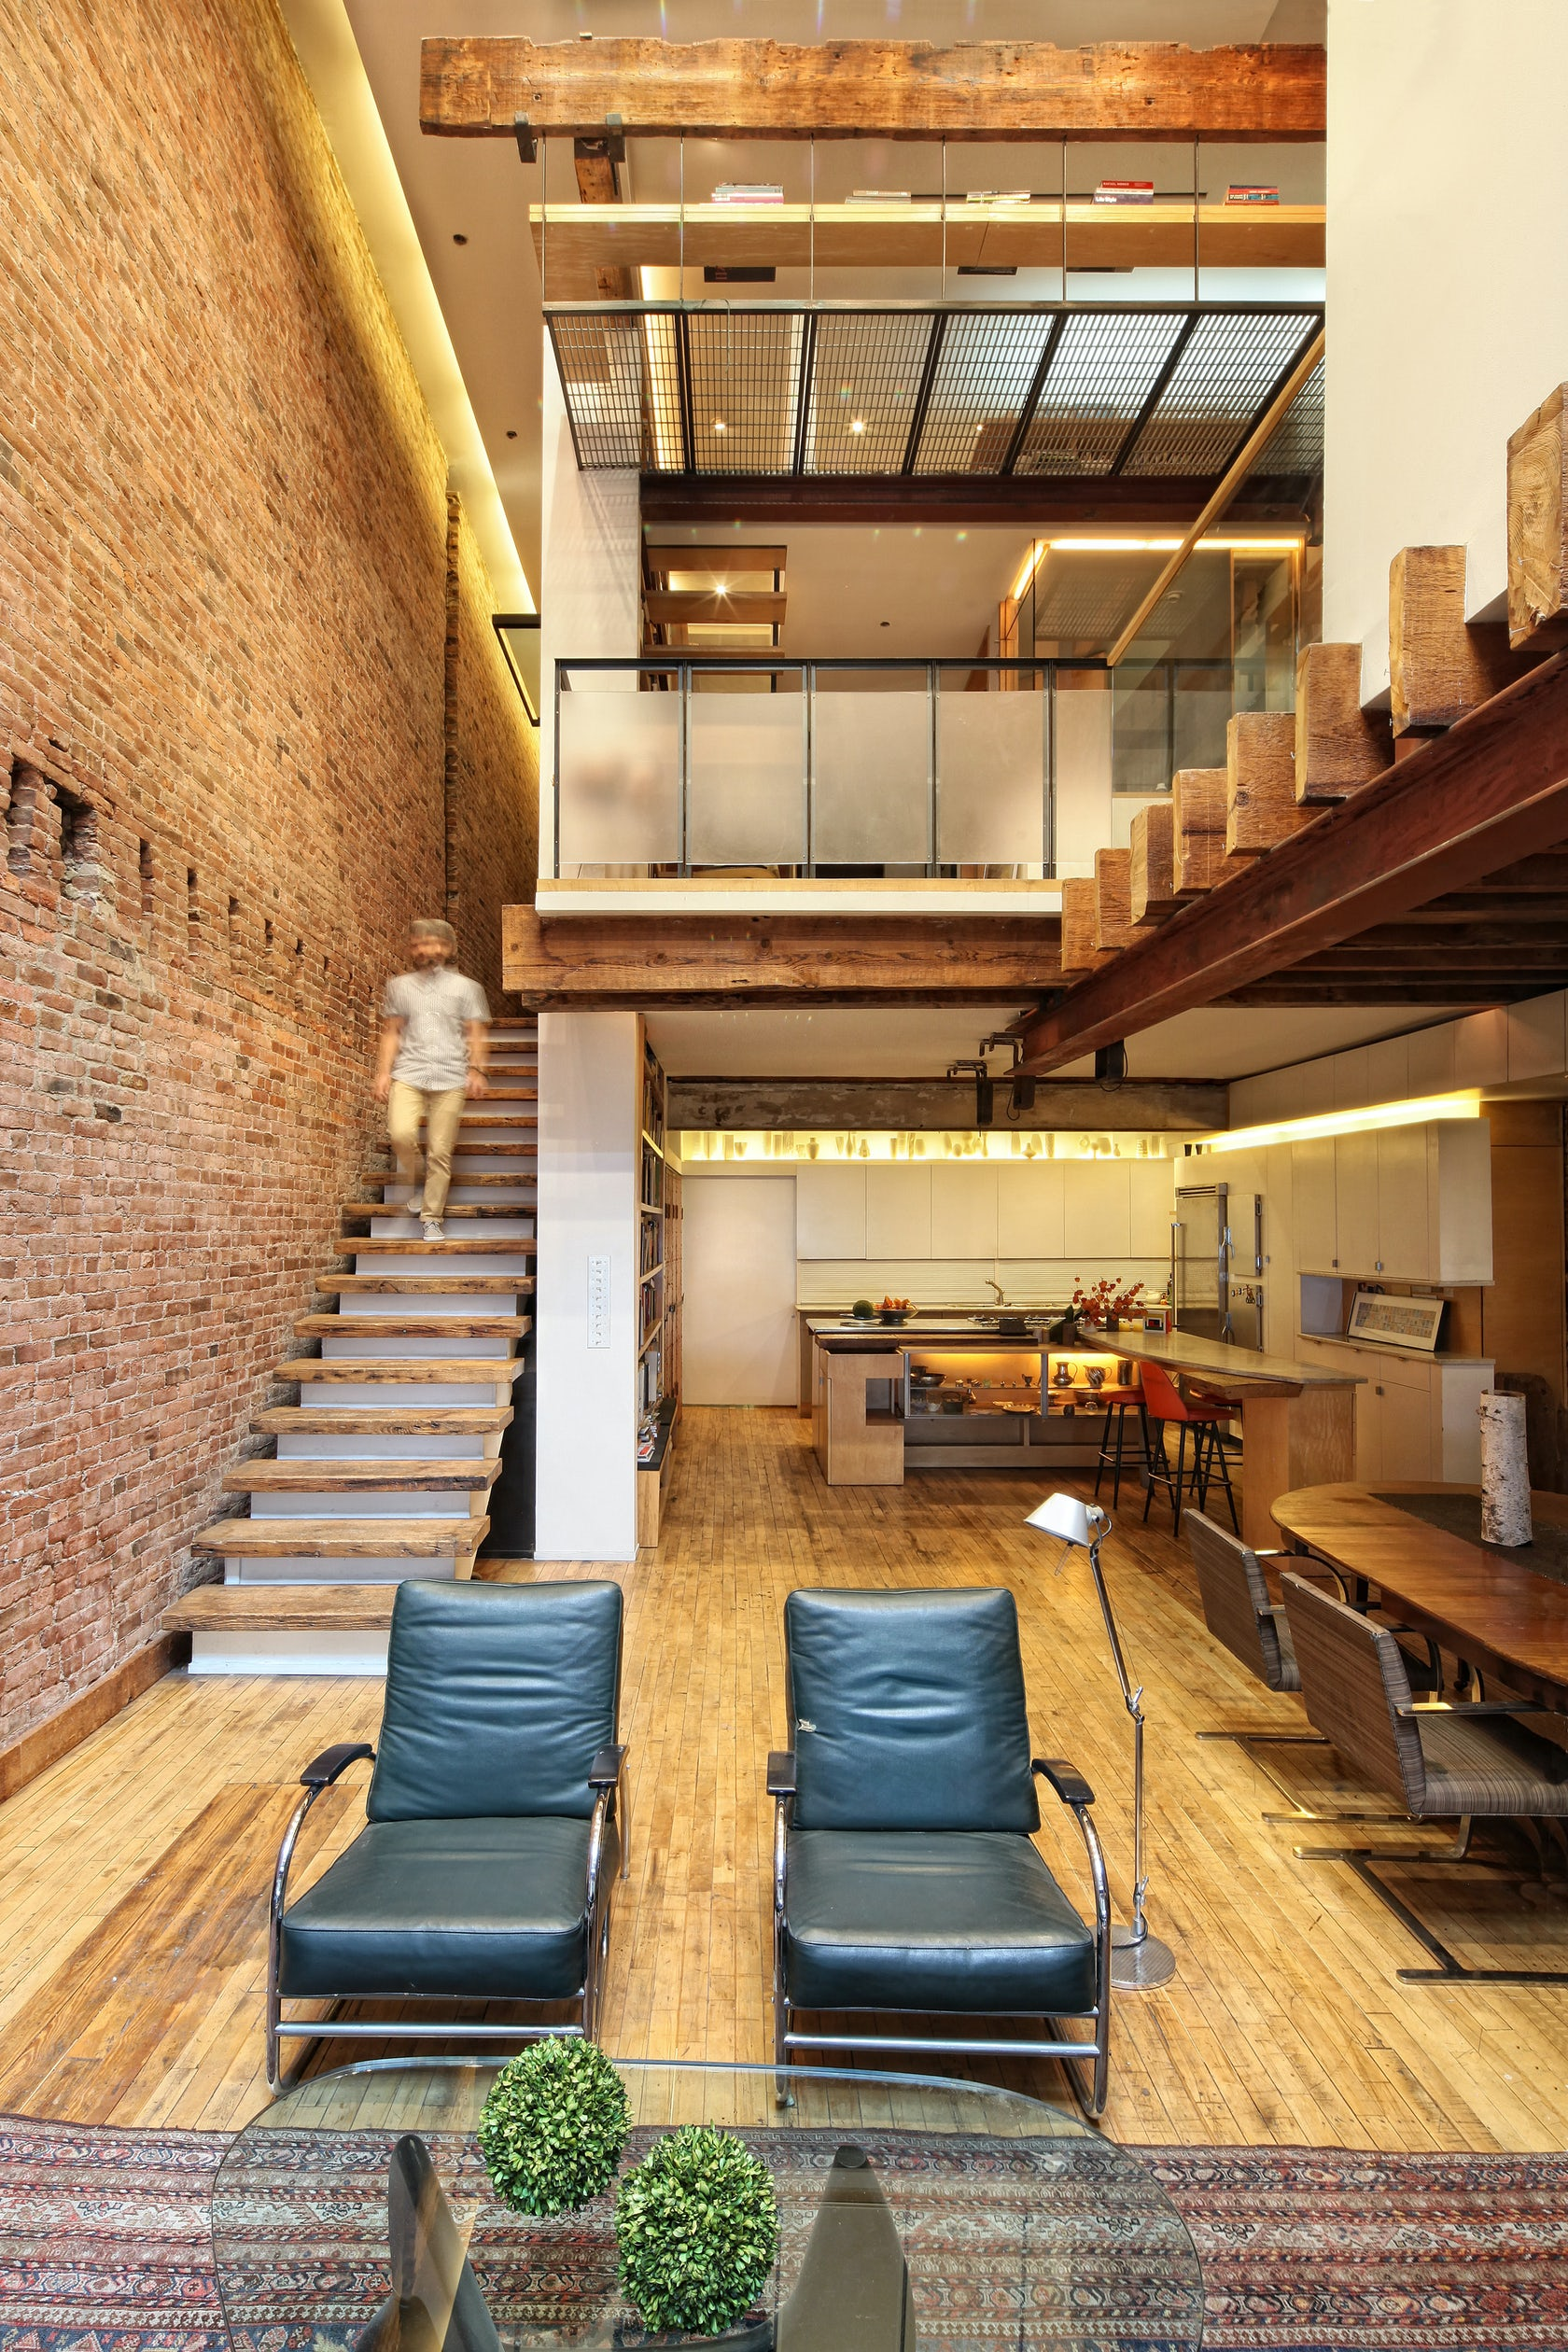 Novabriks Mortarless Brick Siding Offers Overlapping